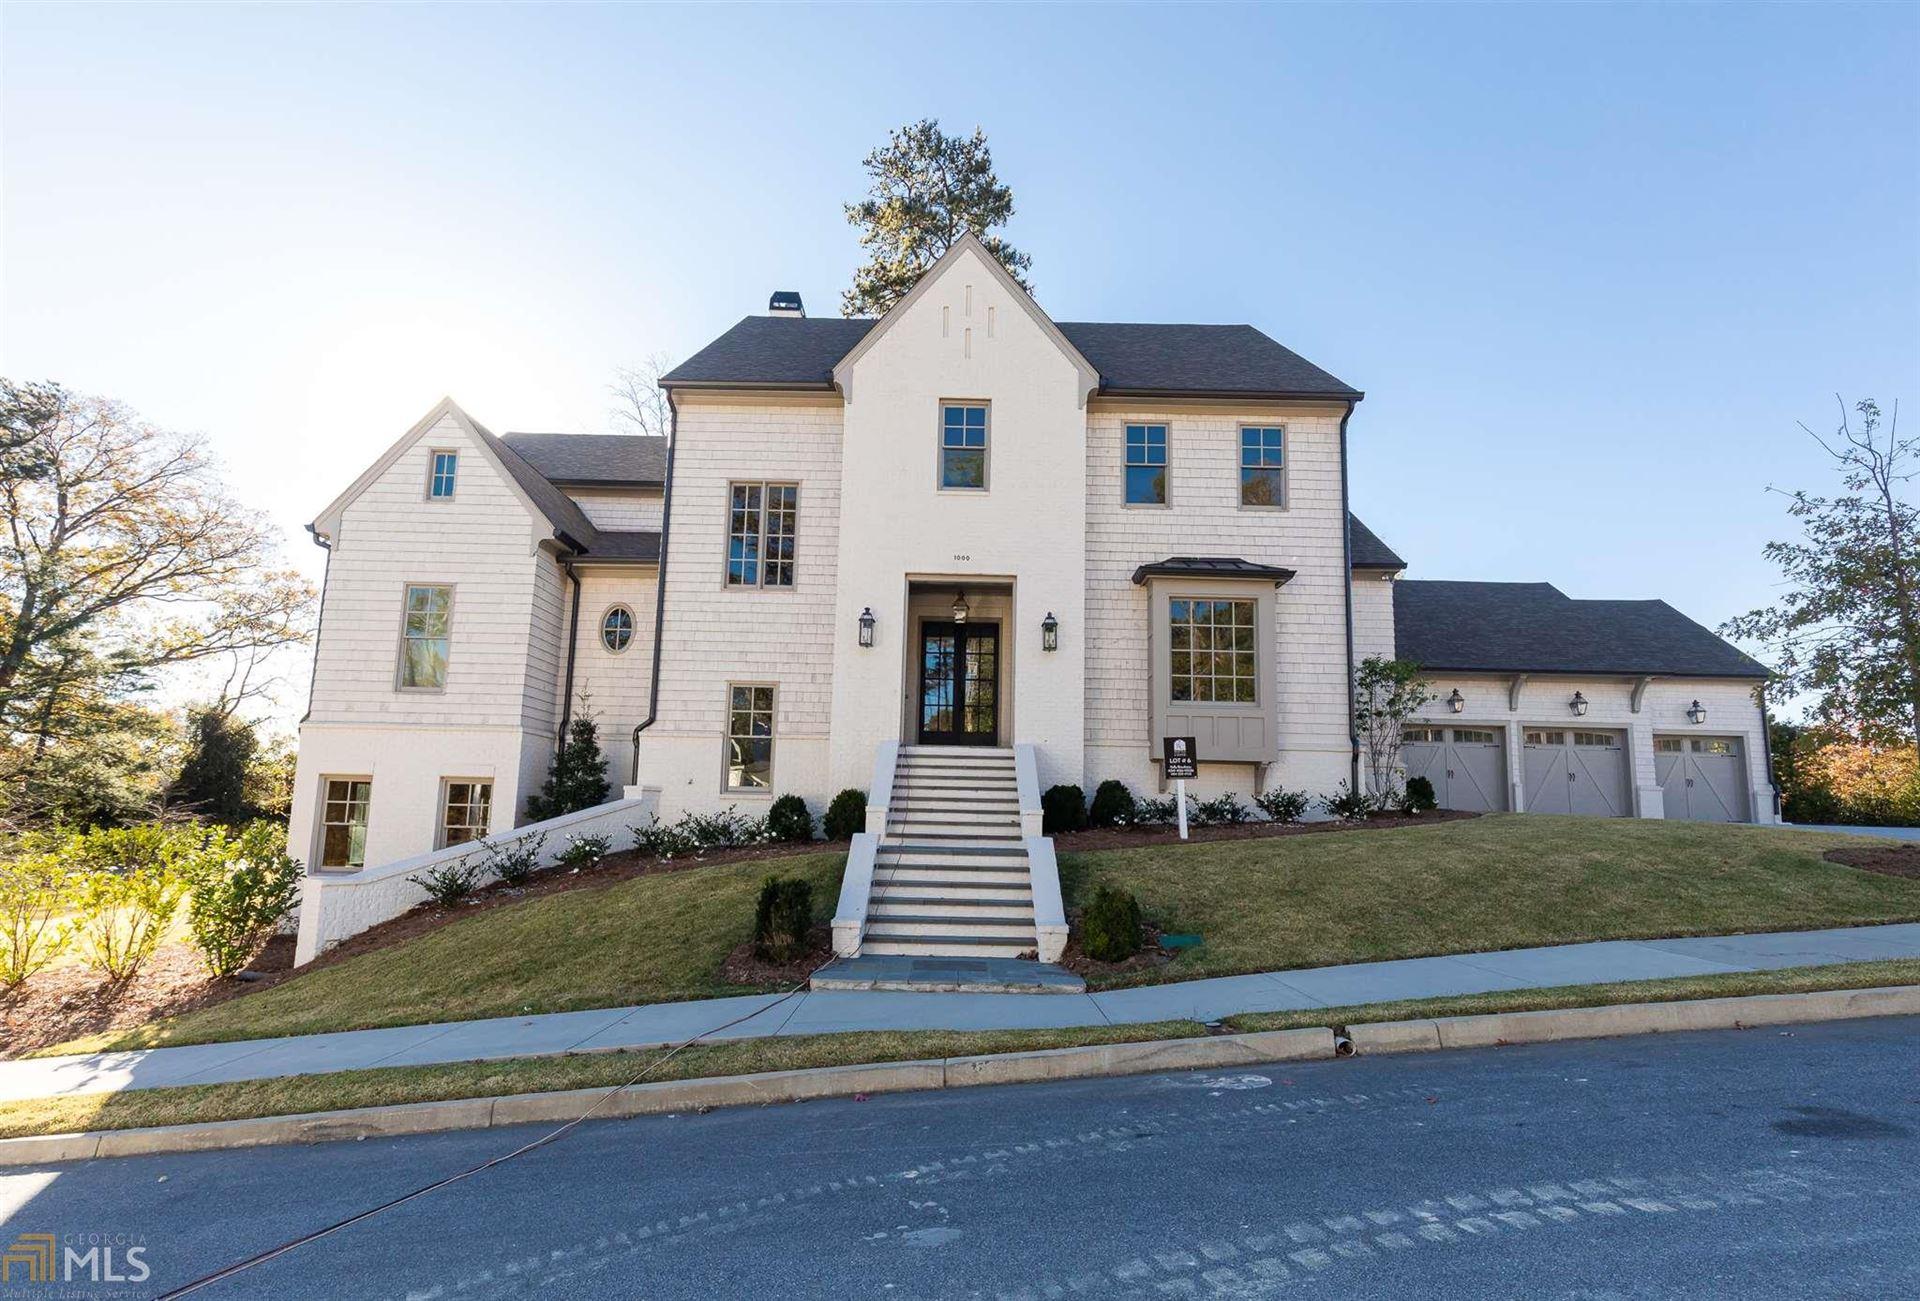 1000 Battle Creek Way, Atlanta, GA 30327 - MLS#: 8809145